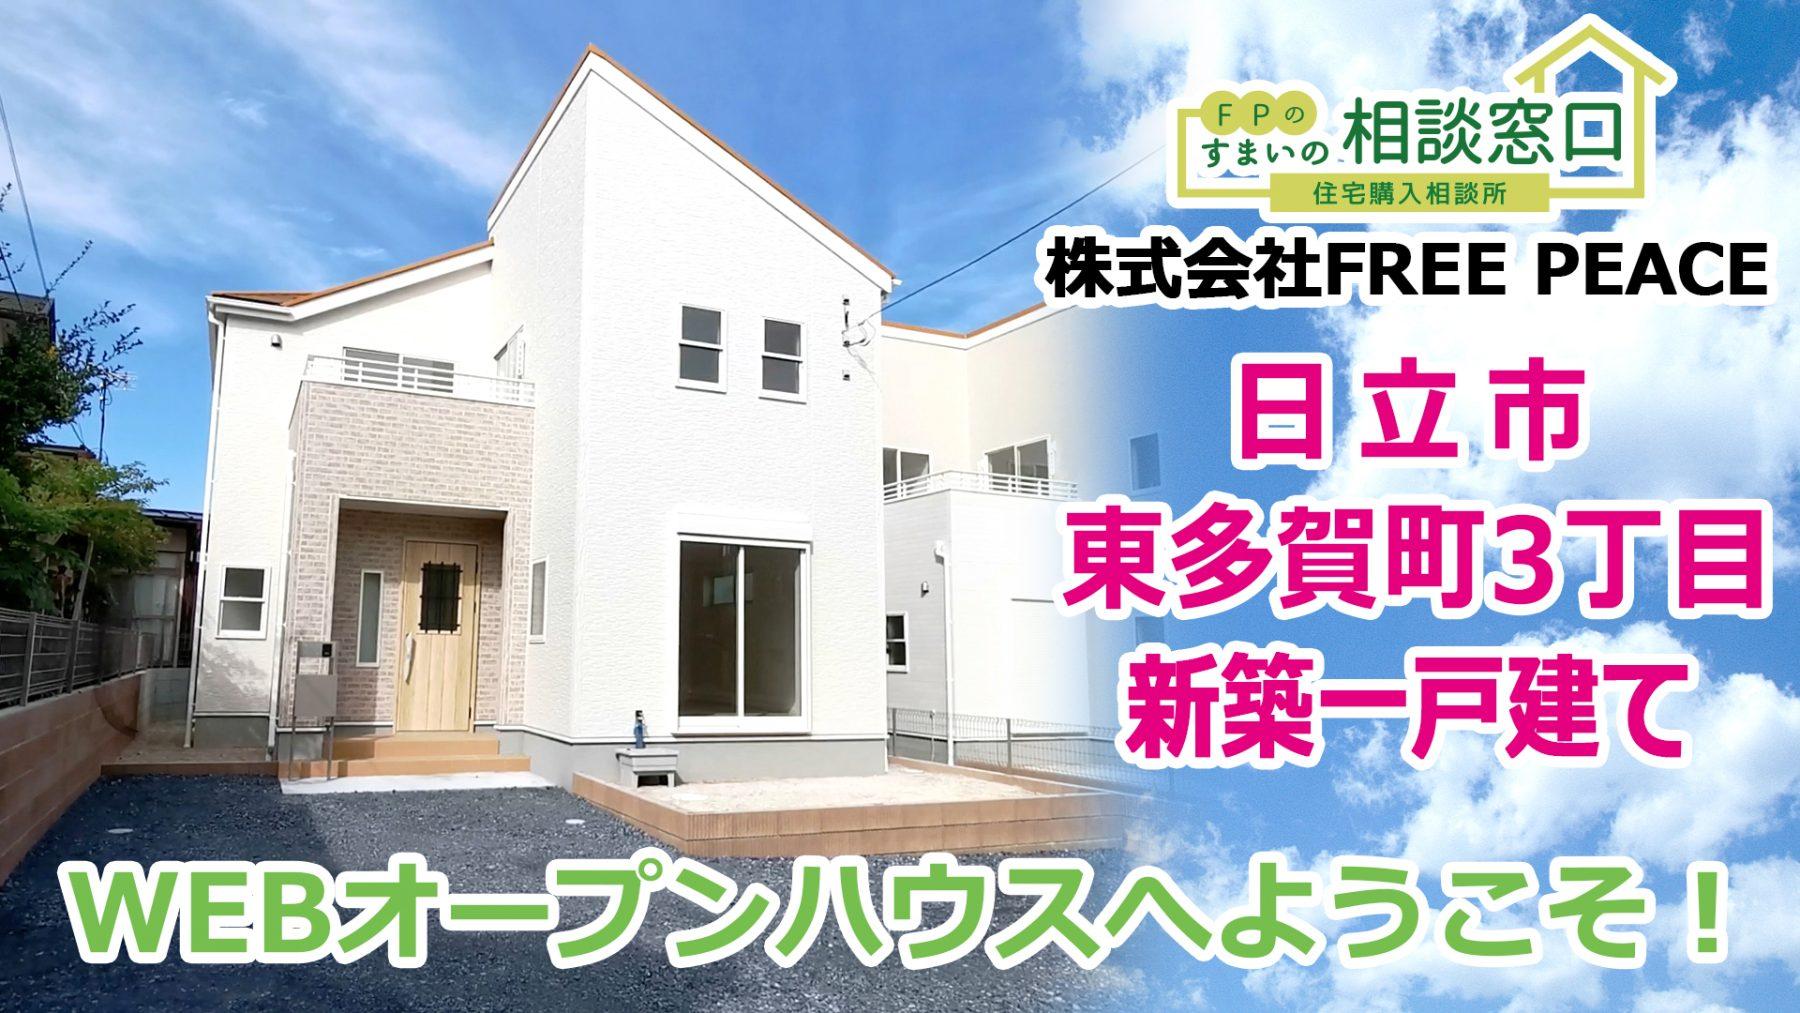 WEBオープンハウス♪日立市東多賀町新築一戸建てです。